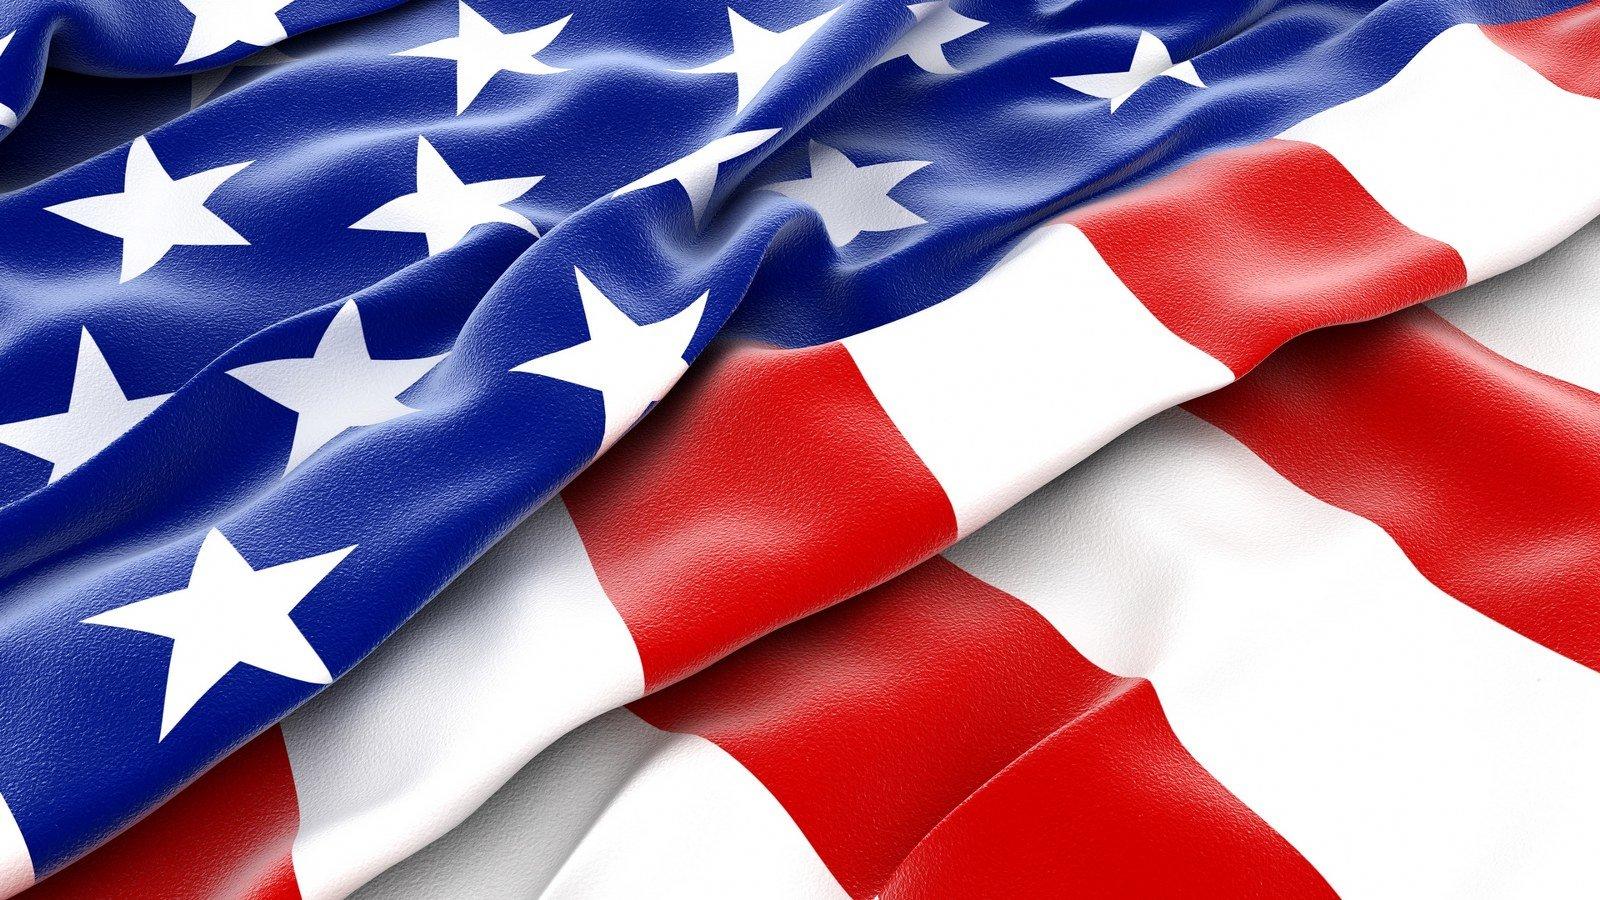 Free Download American Flag Wallpaper ID479682 Hd 1600x900 For Desktop